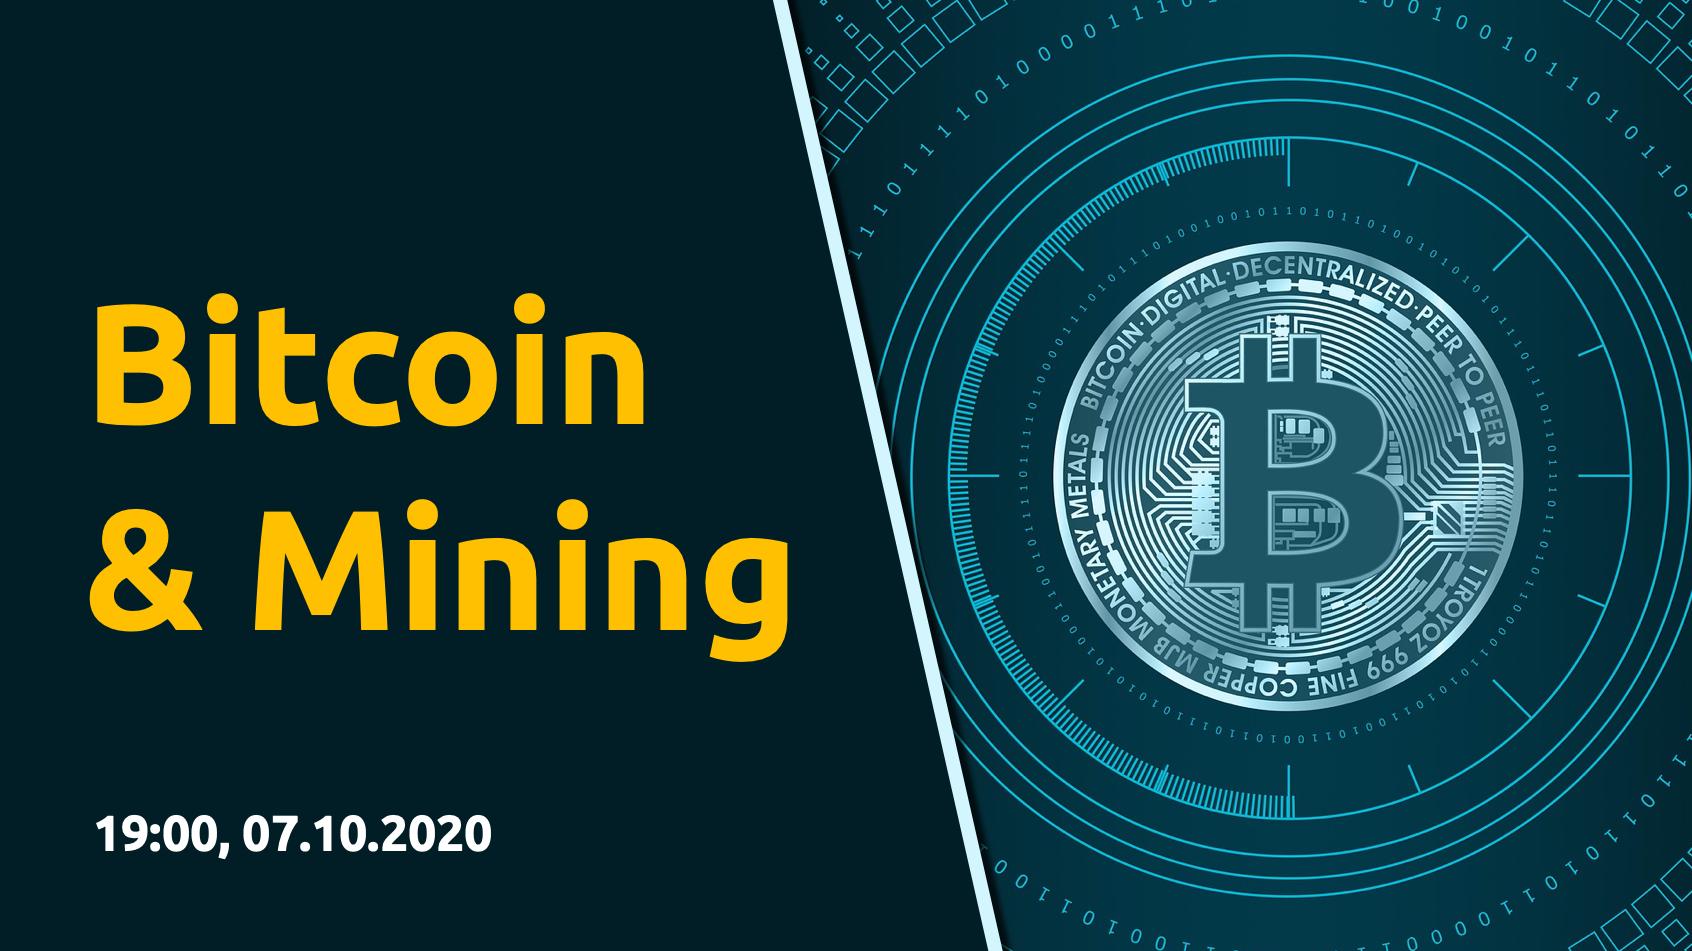 Bitcoin & Mining